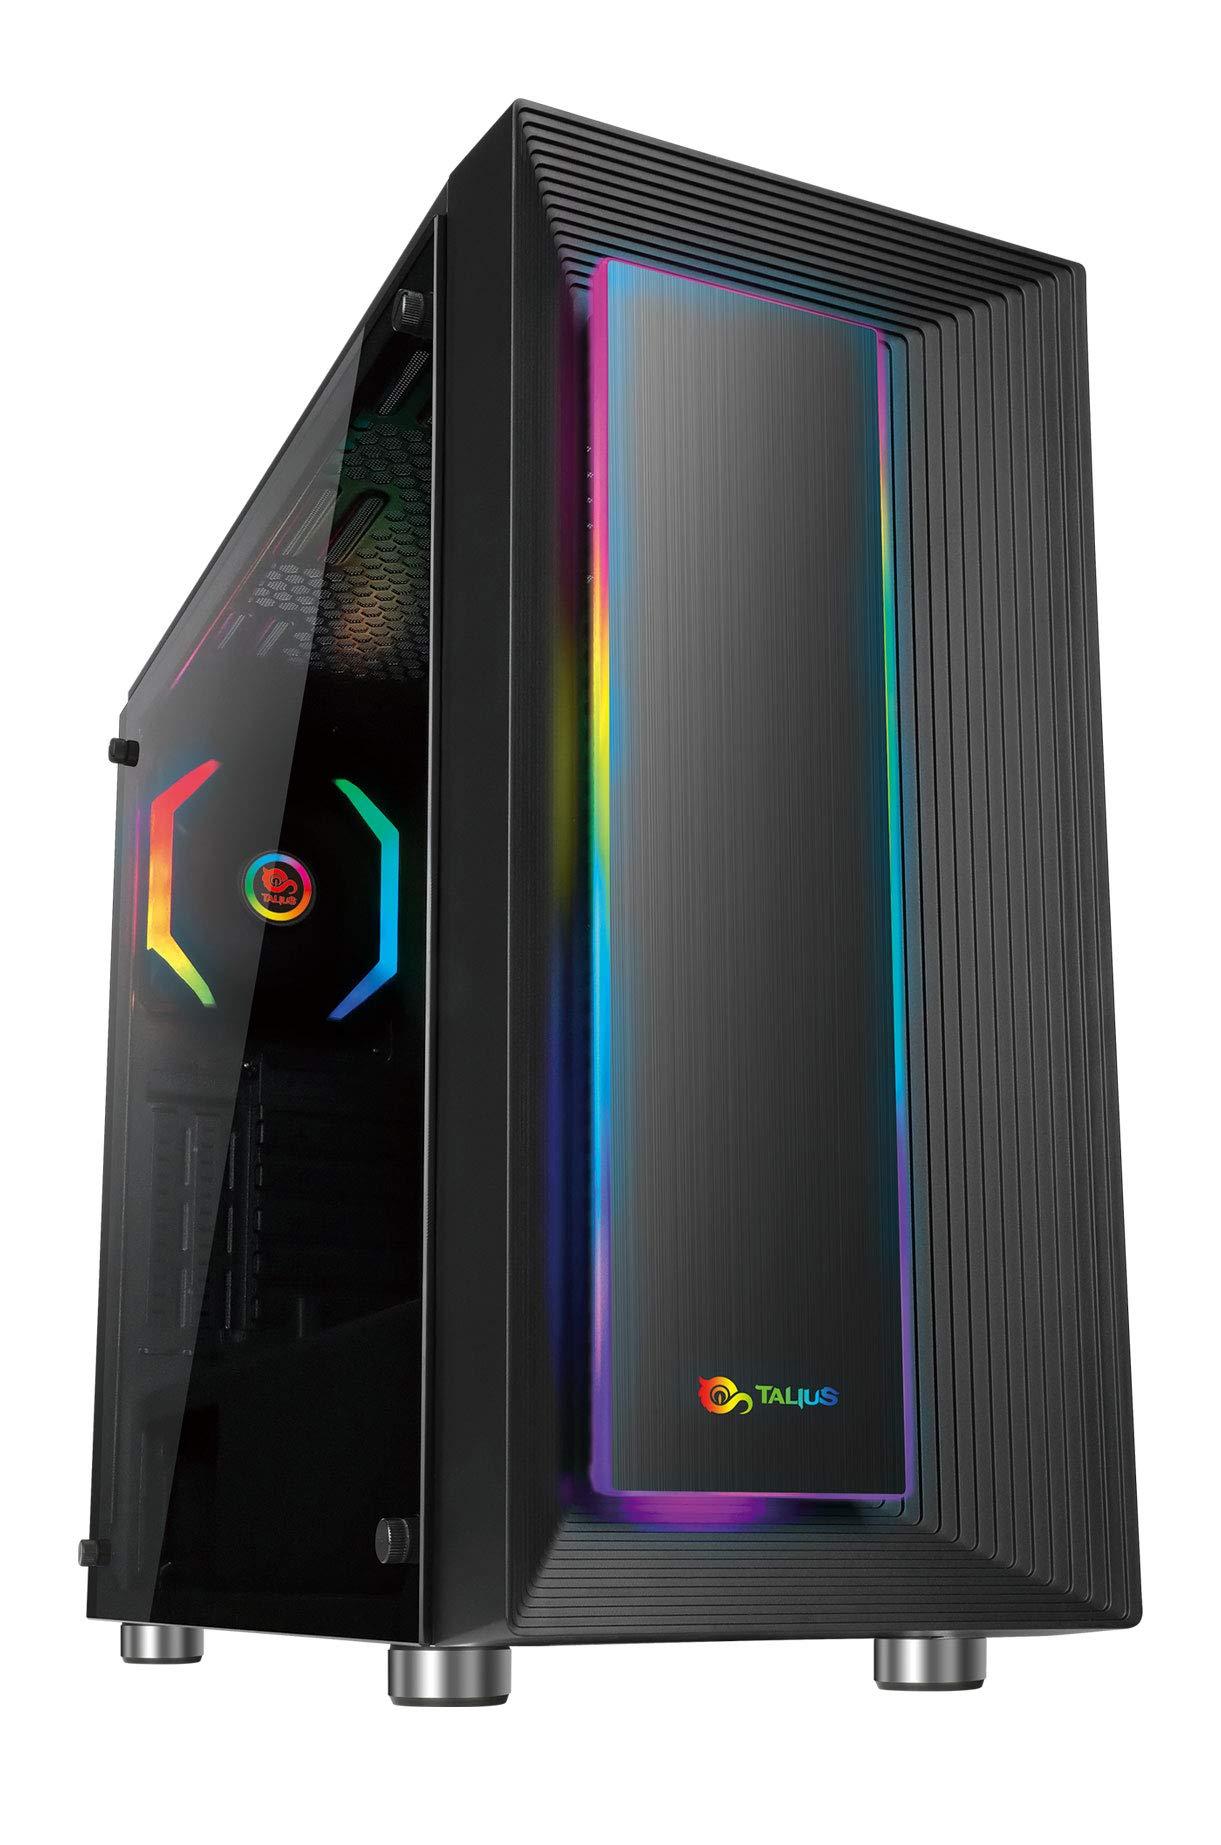 Talius Caja ATX Gaming Auriga Cristal Templado USB 3.0: Amazon.es: Informática